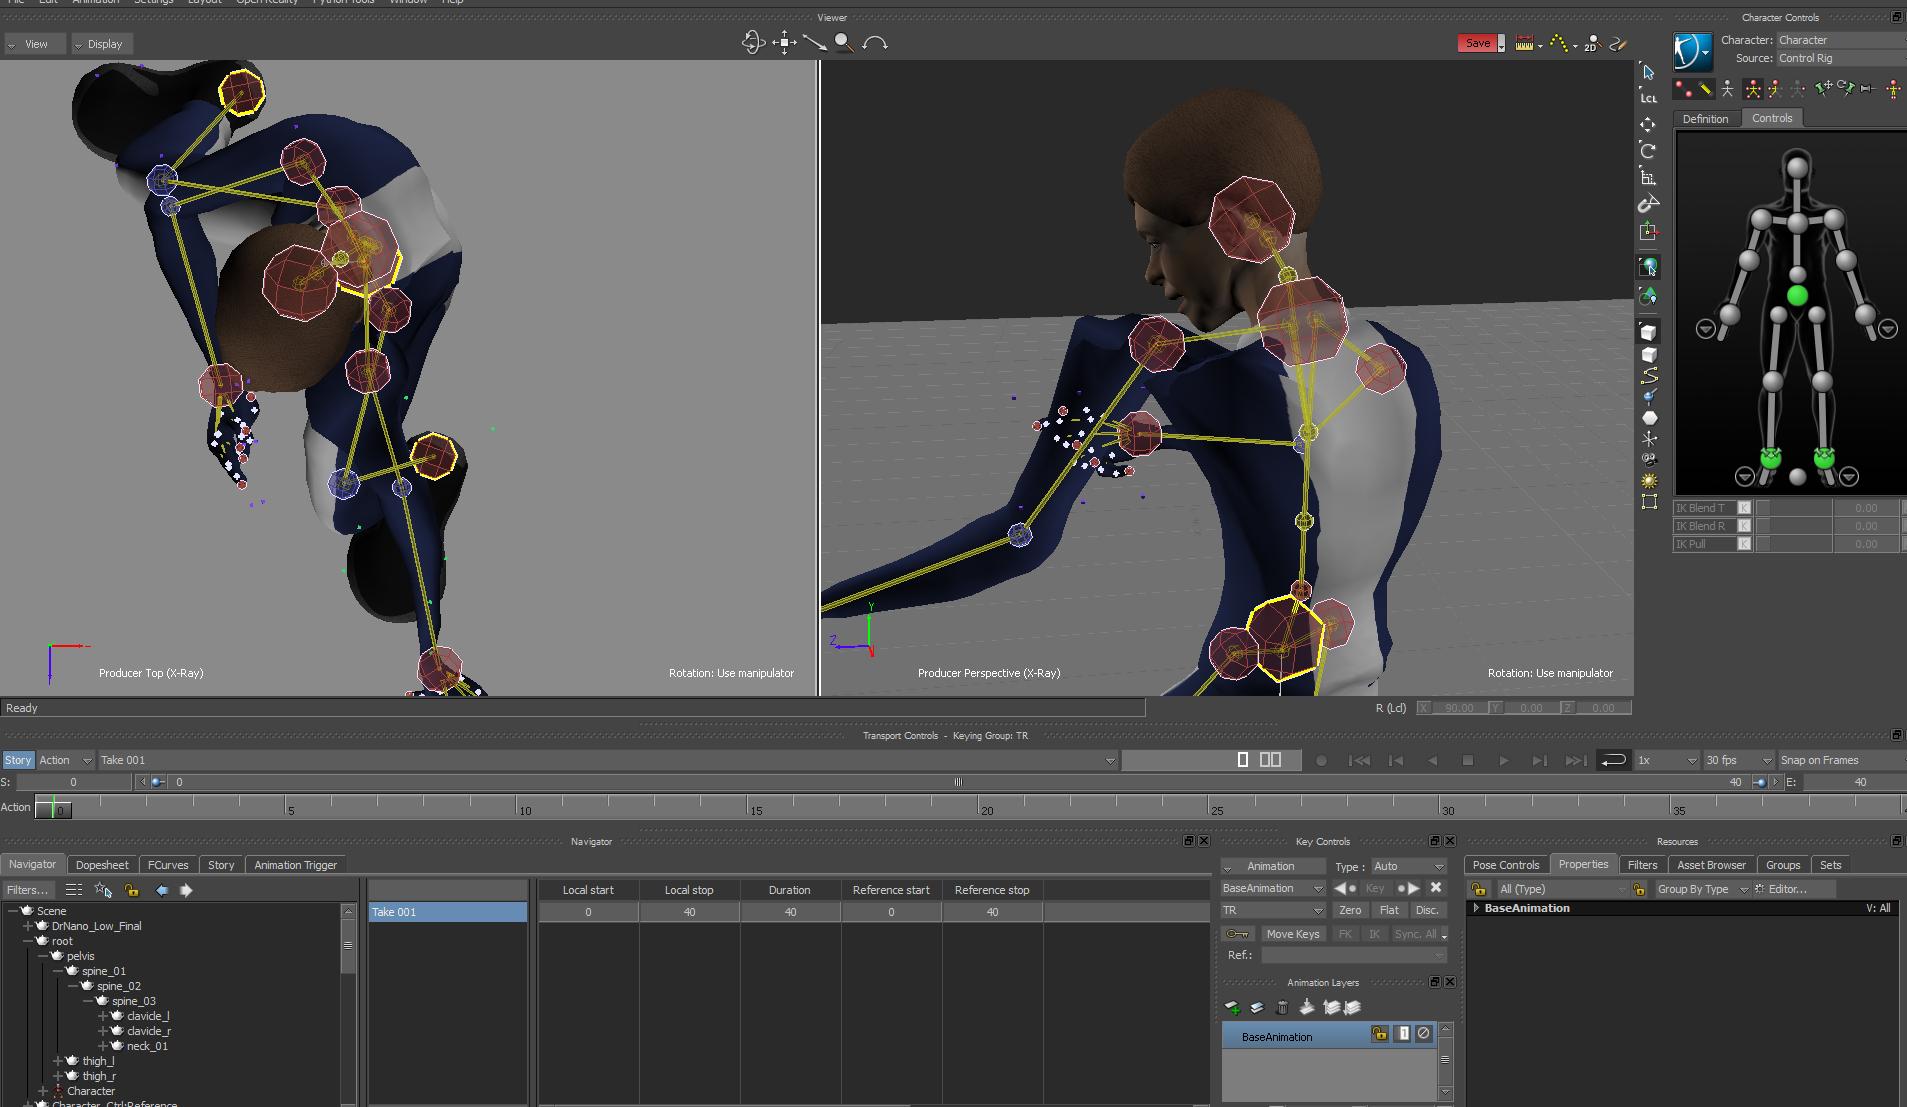 Animation Retargeting retargeting animation in motionbuilder - autodesk community